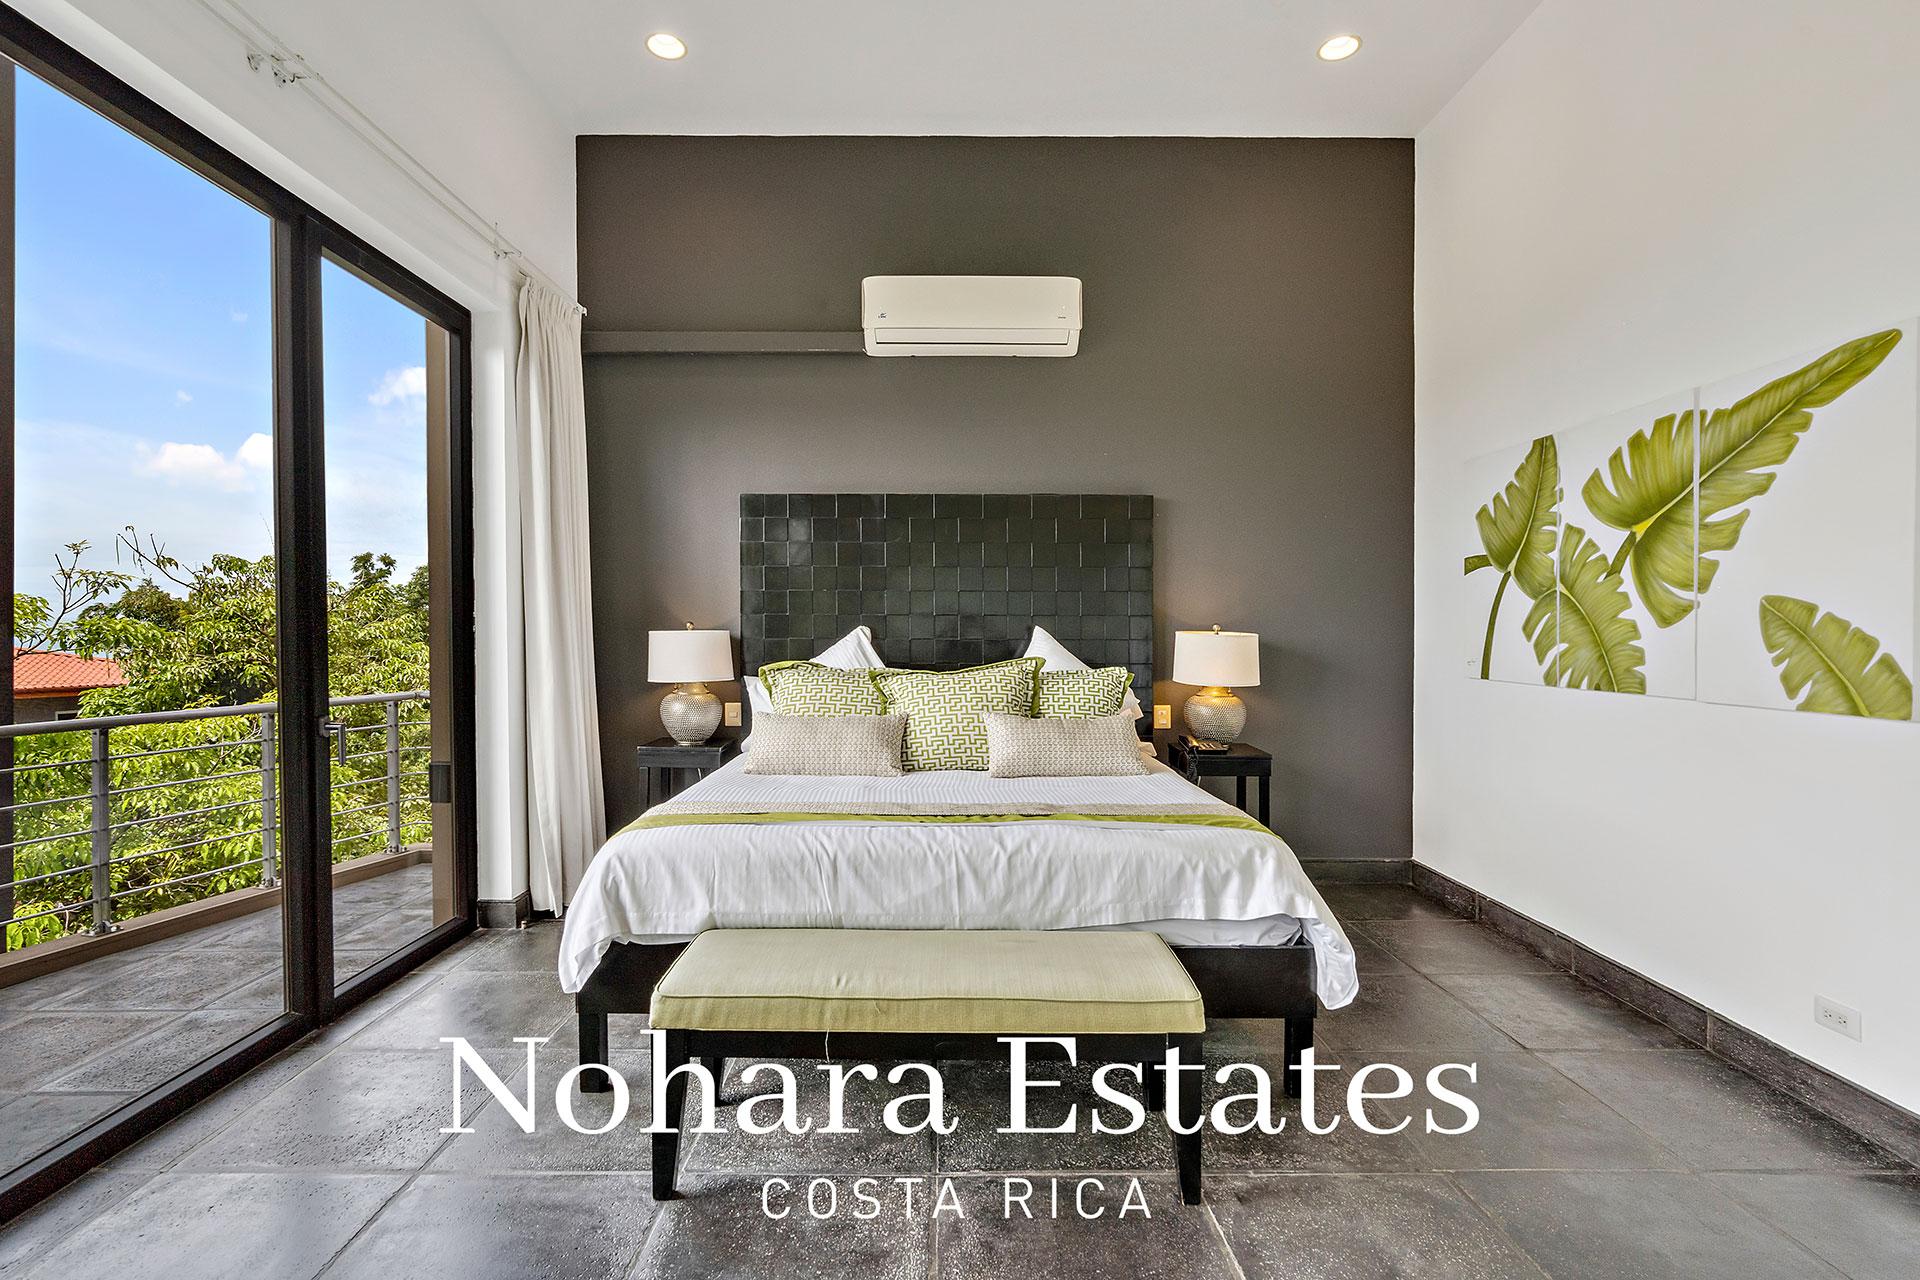 Nohara Estates Costa Rica 128 Penthouse Quepos Los Altos 3